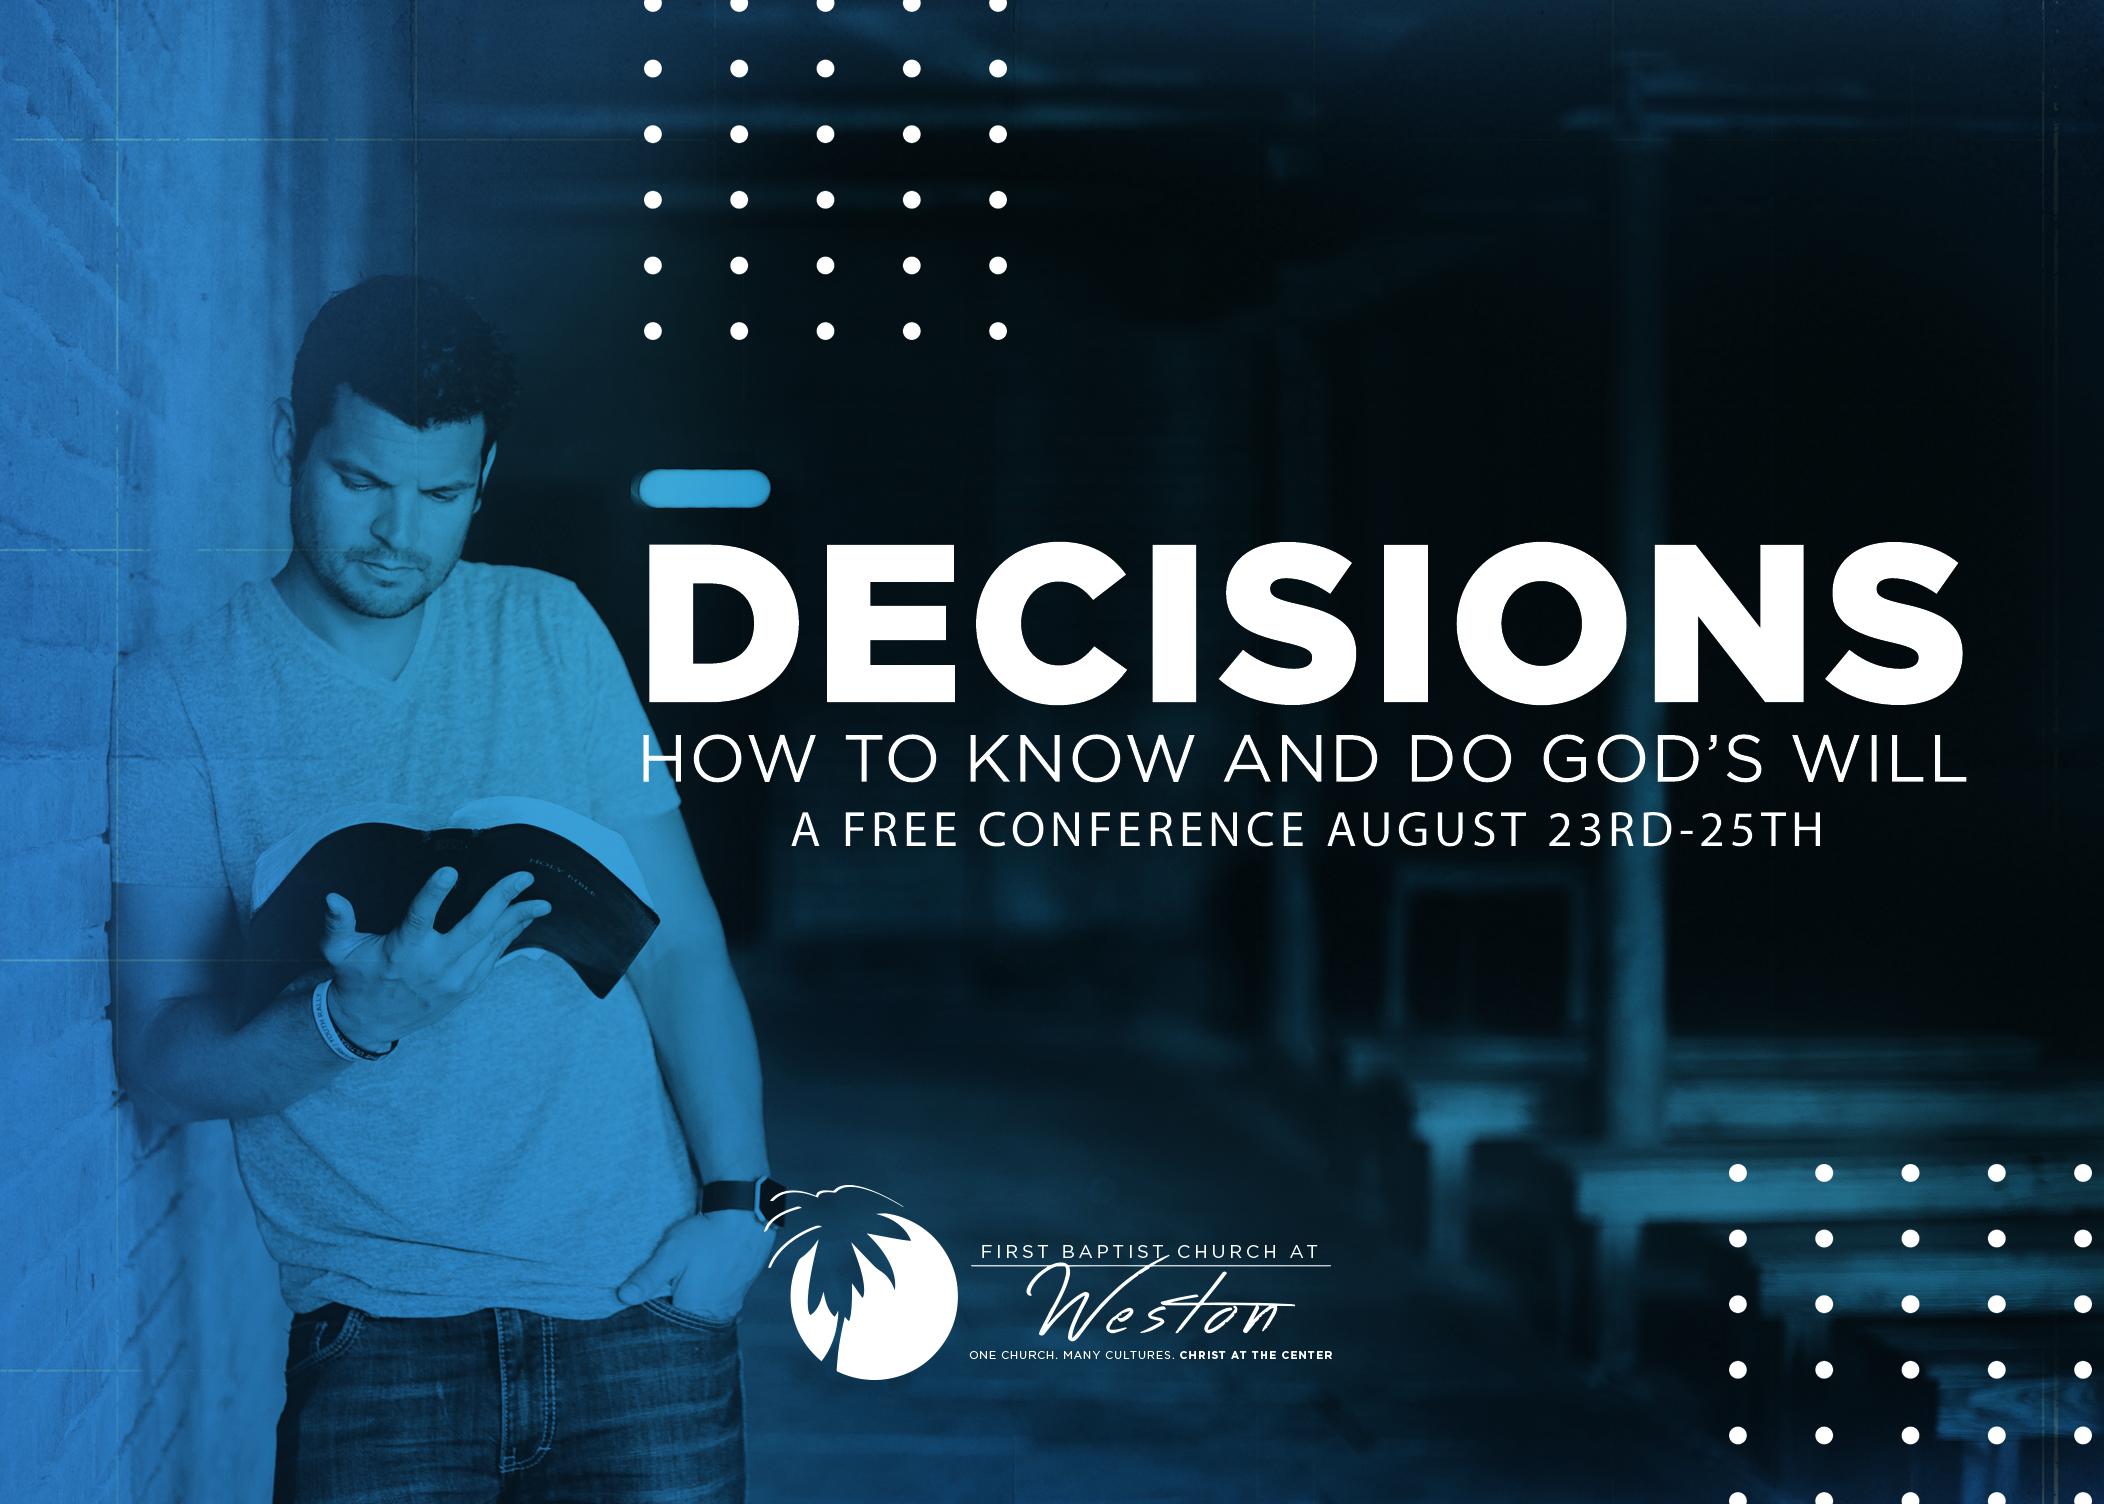 Worship Guide – FBC Weston